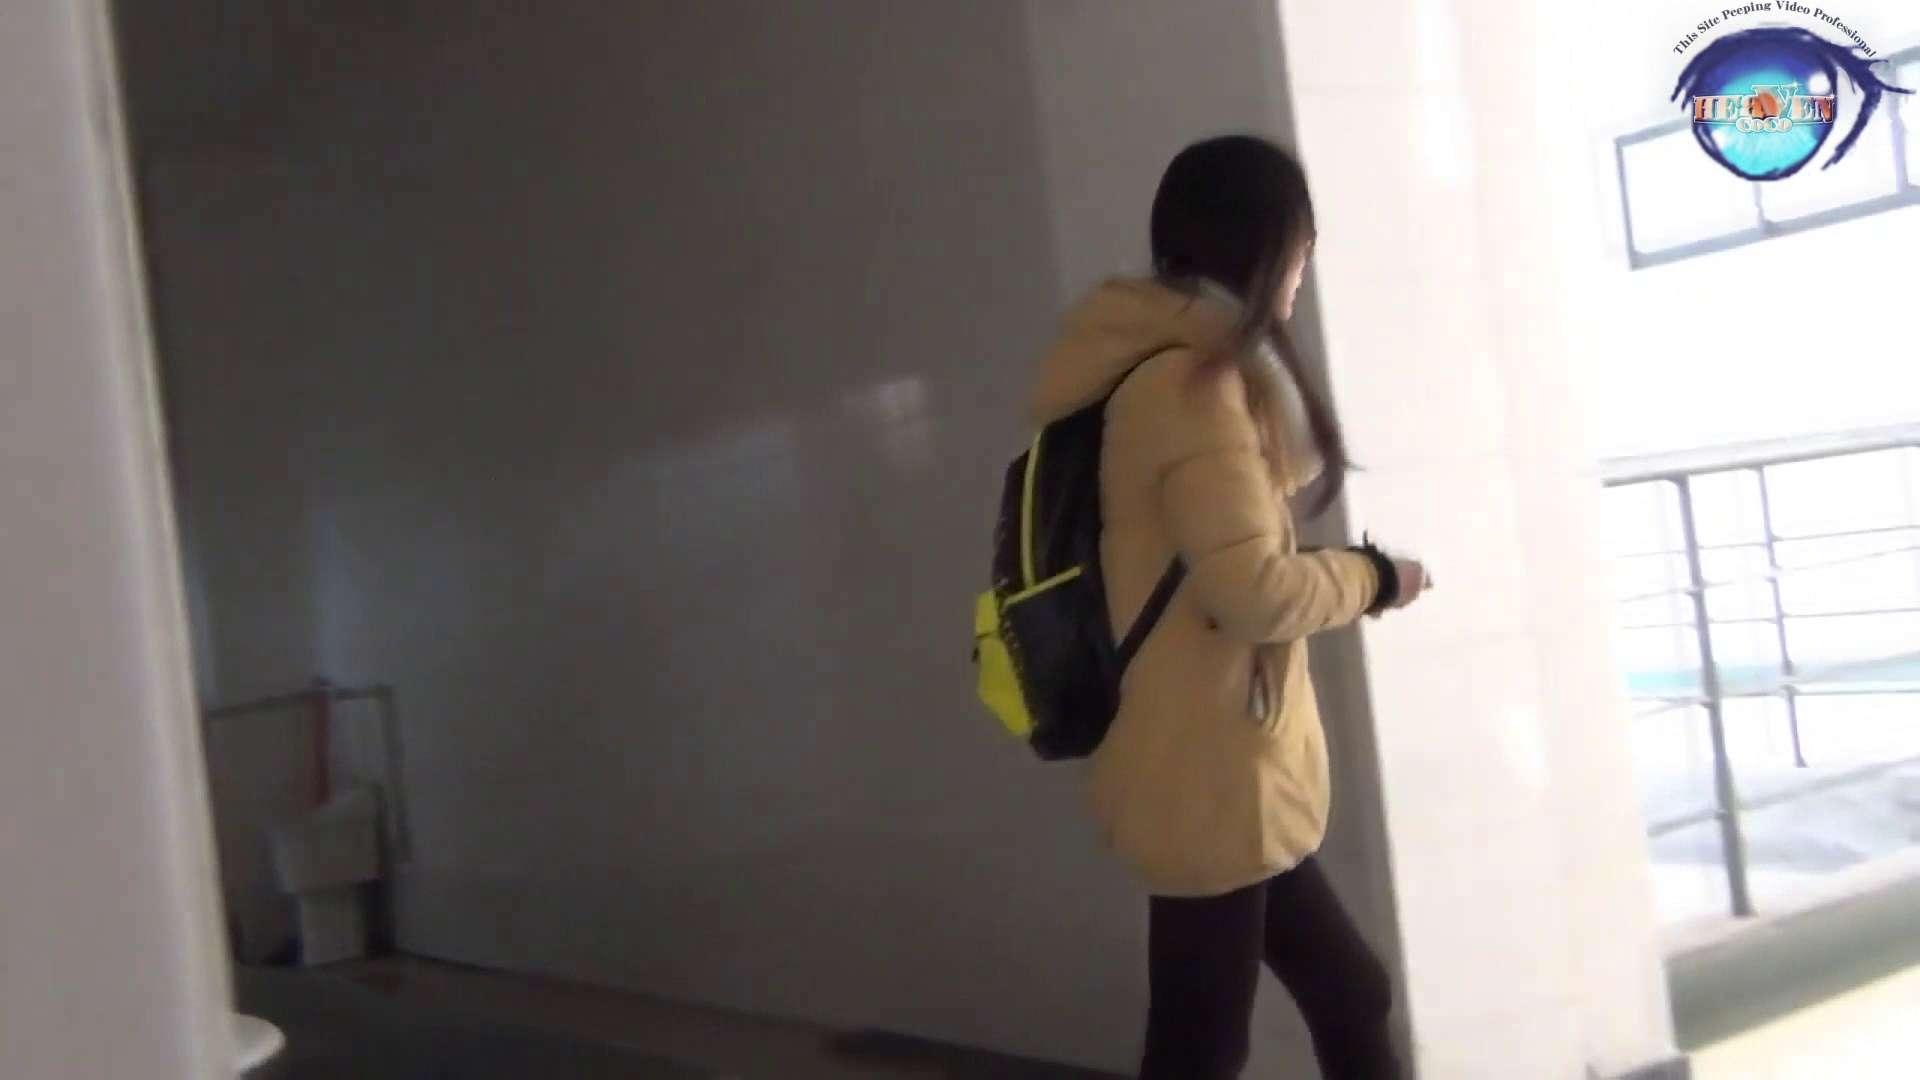 GOD HAND 芸術大学盗撮‼vol.55 盗撮師作品 盗撮動画紹介 105pic 70